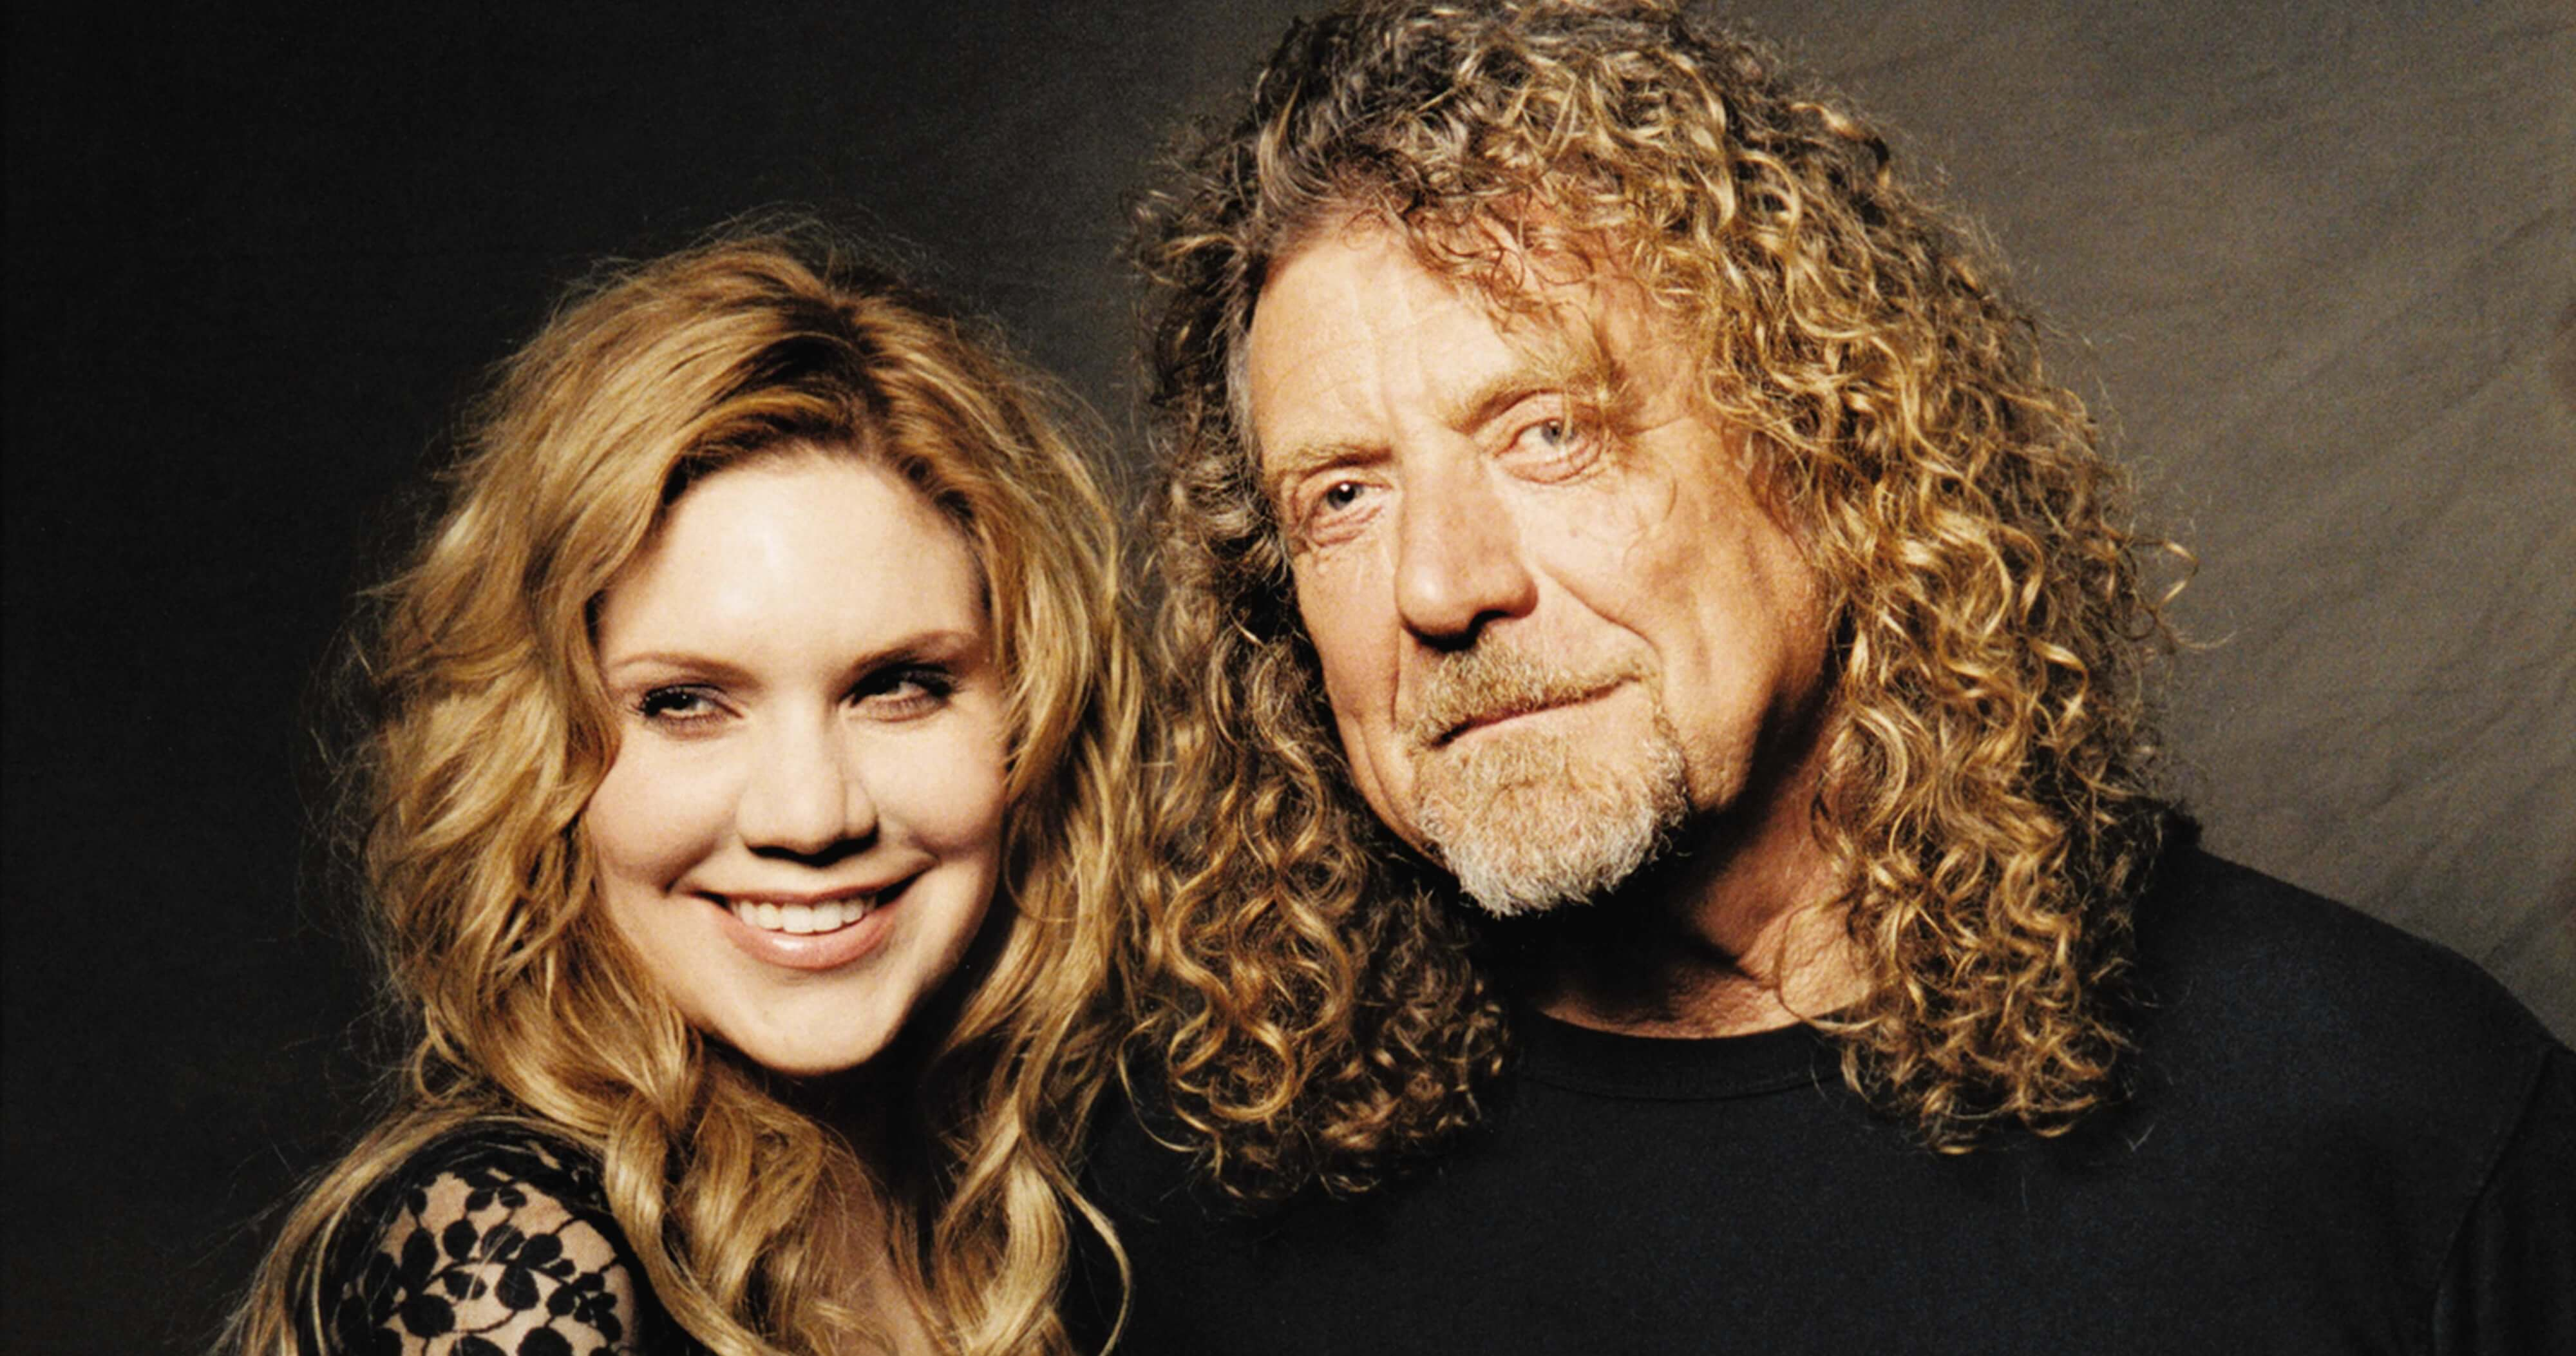 Robert Plant & Alison Krauss Unveil New Collaboration